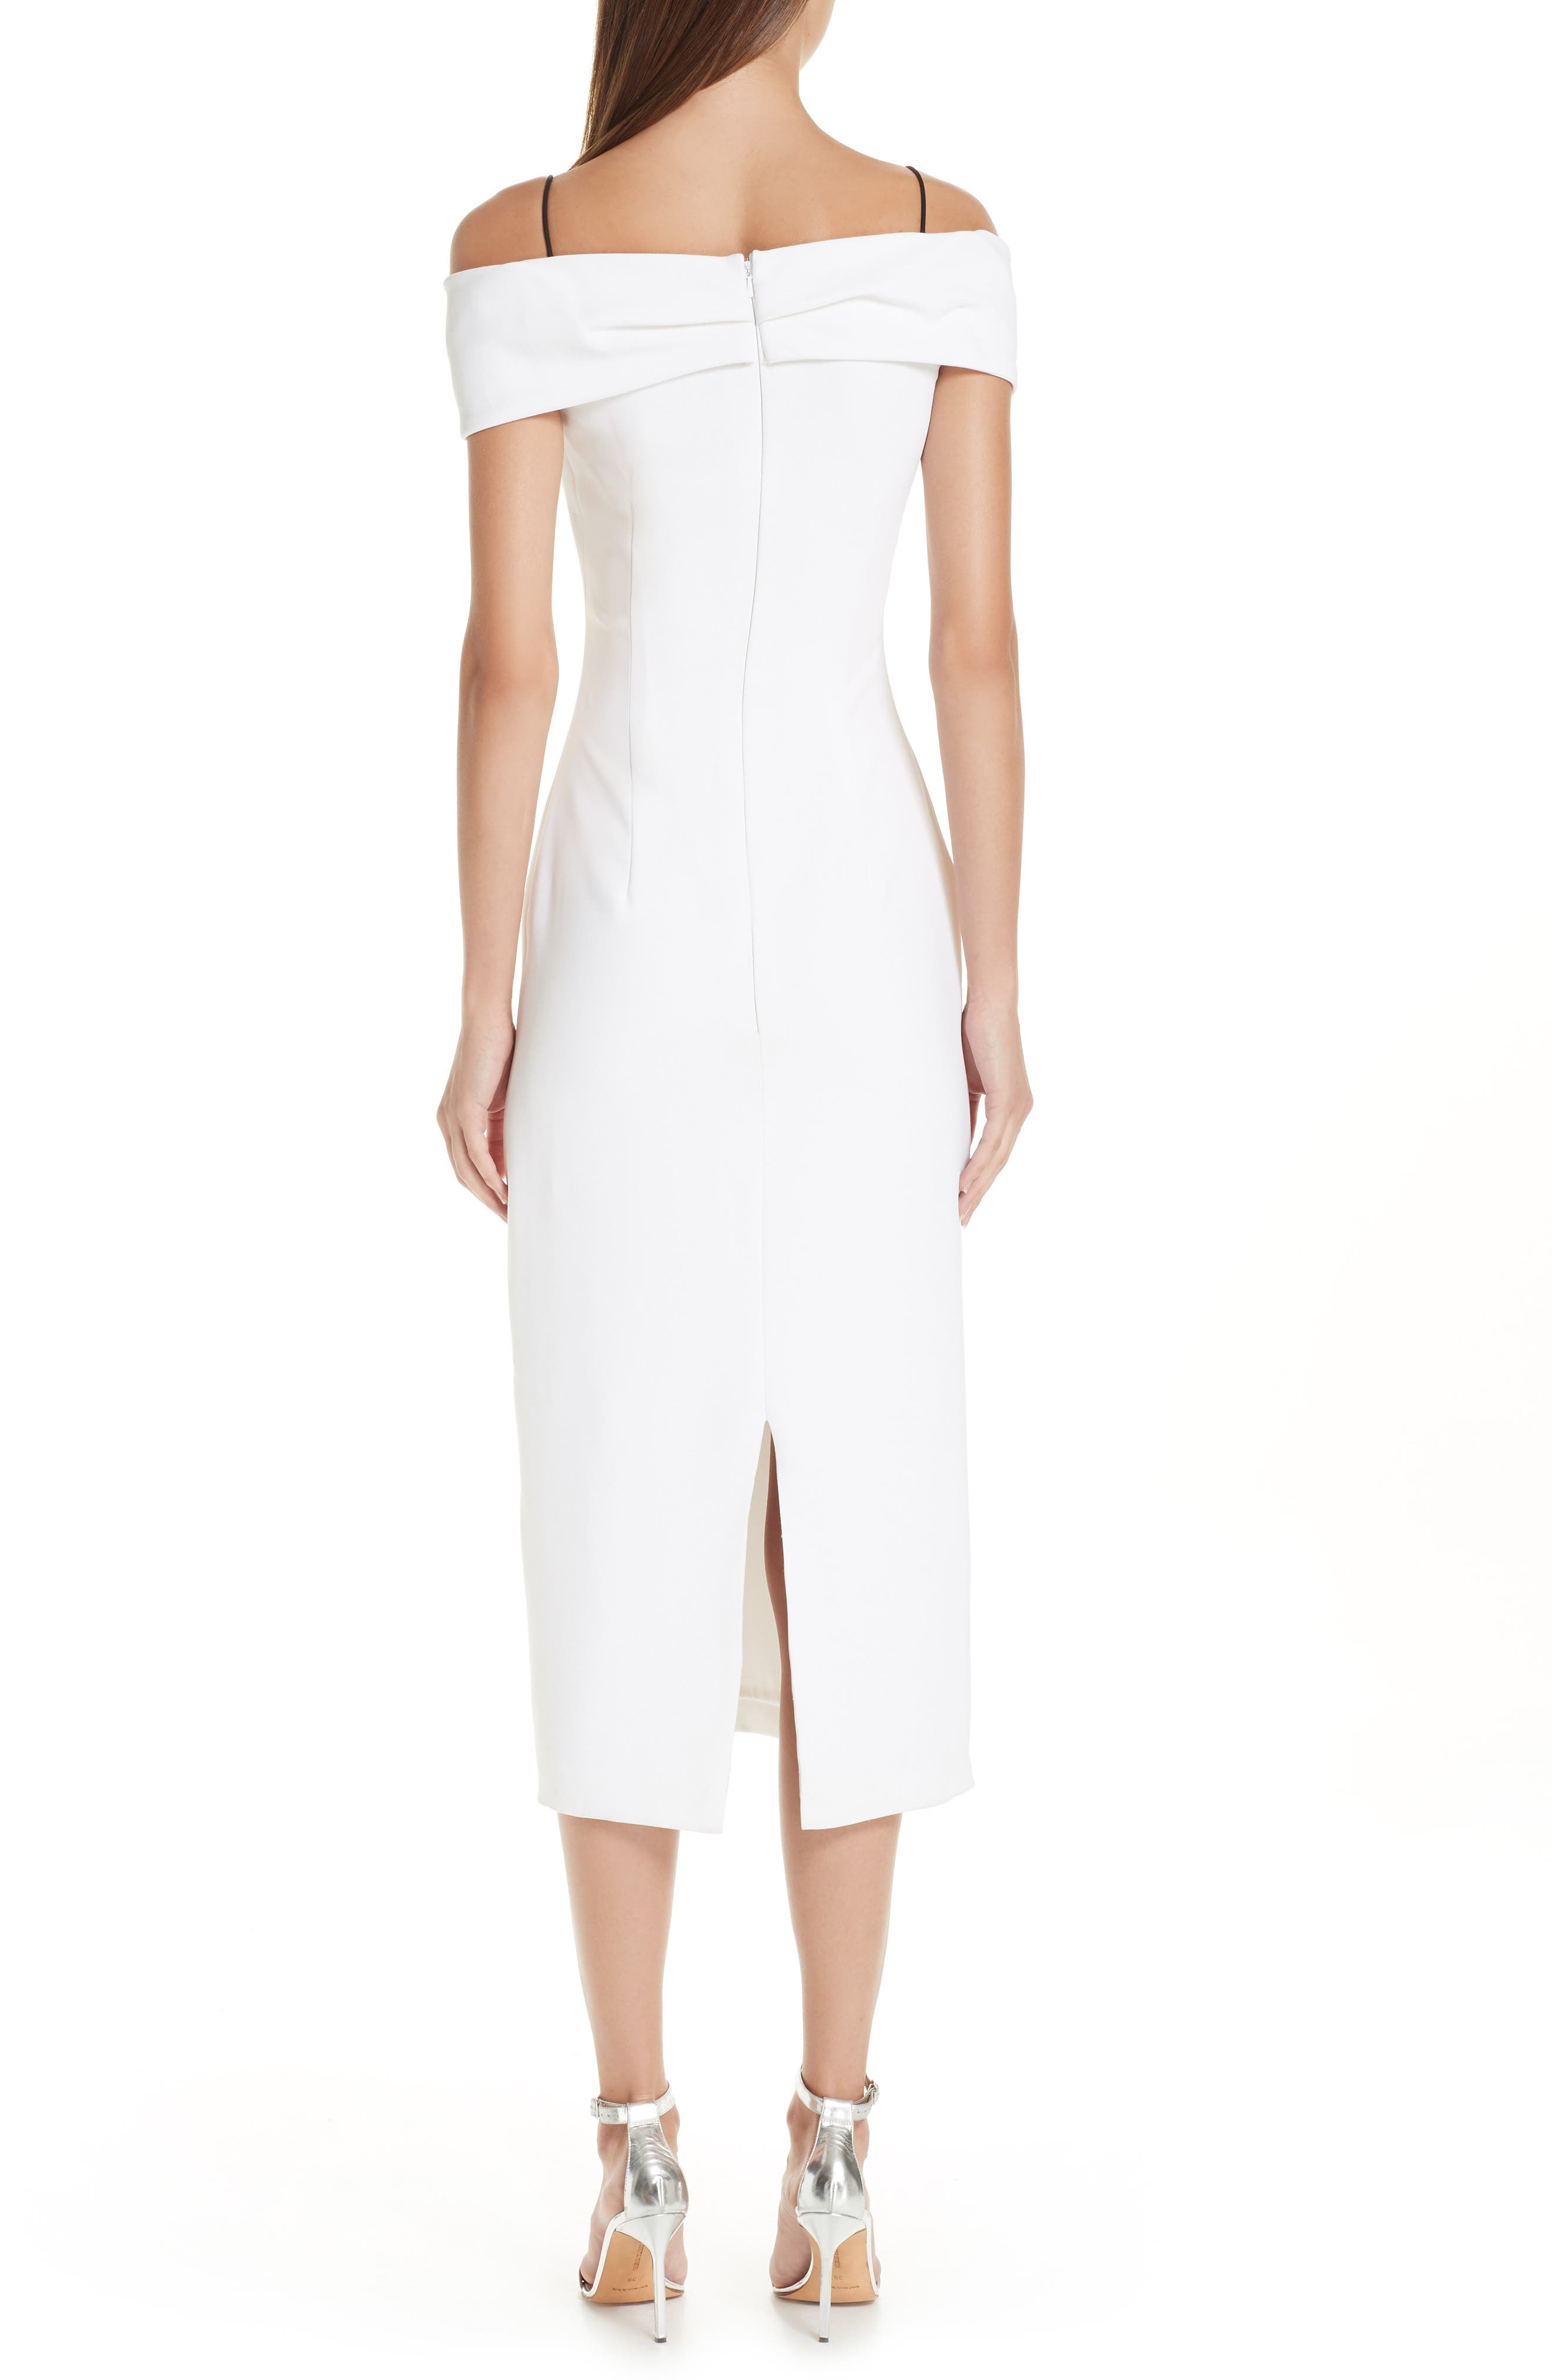 CUSHNIE, Layered Off the Shoulder Dress, Alternate thumbnail 2, color, WHITE/ BLACK